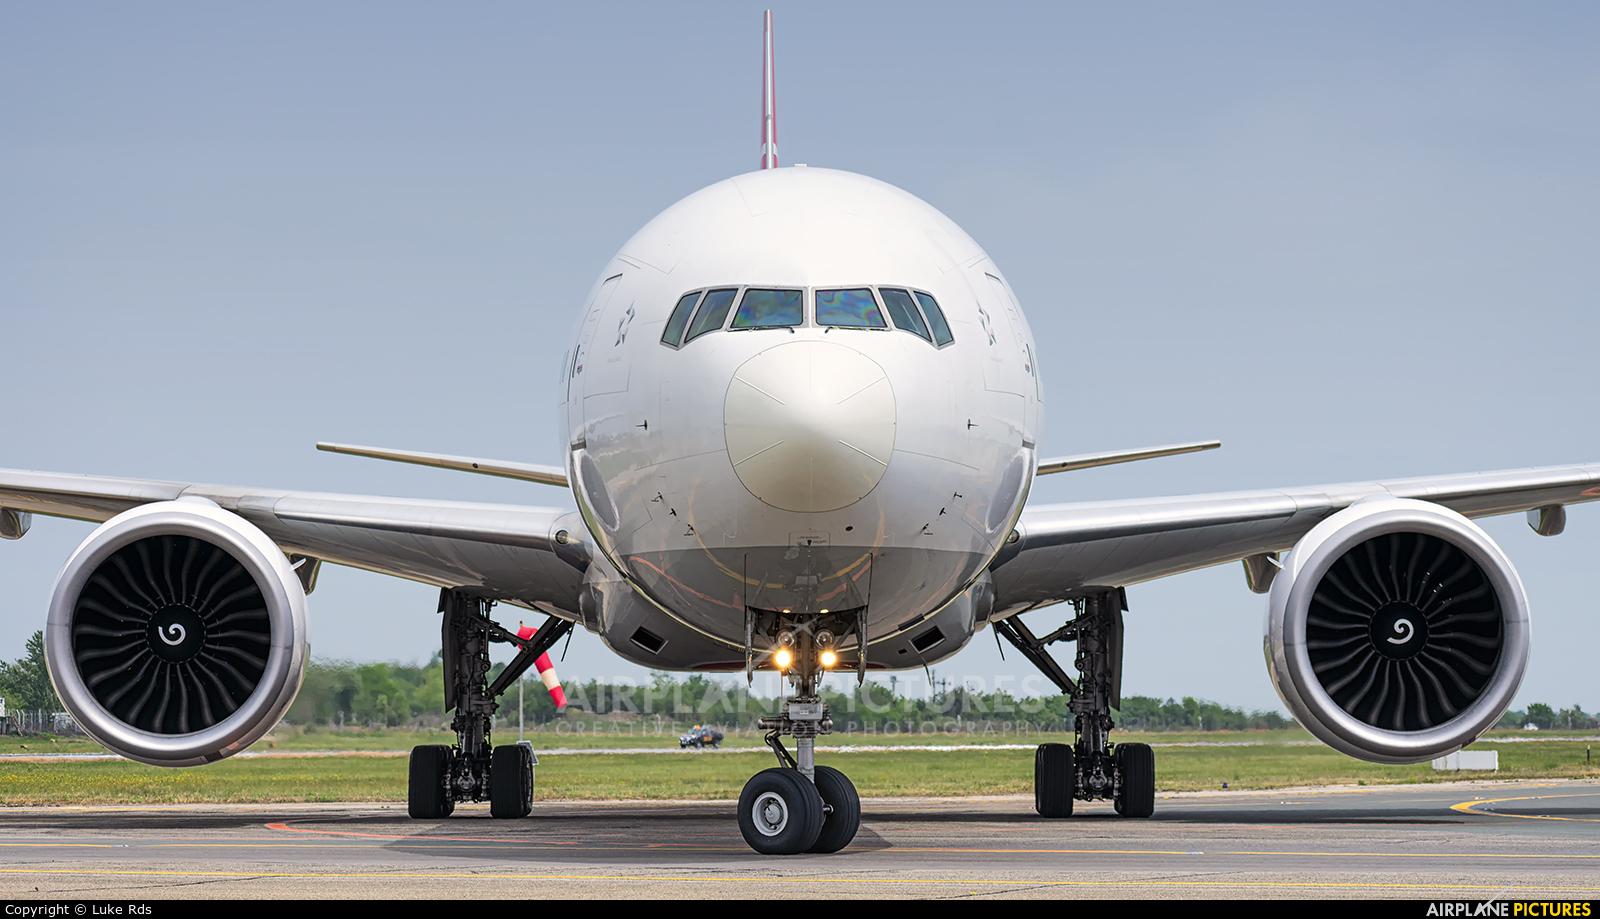 Turkish Airlines TC-LJH aircraft at Bucharest - Henri Coandă